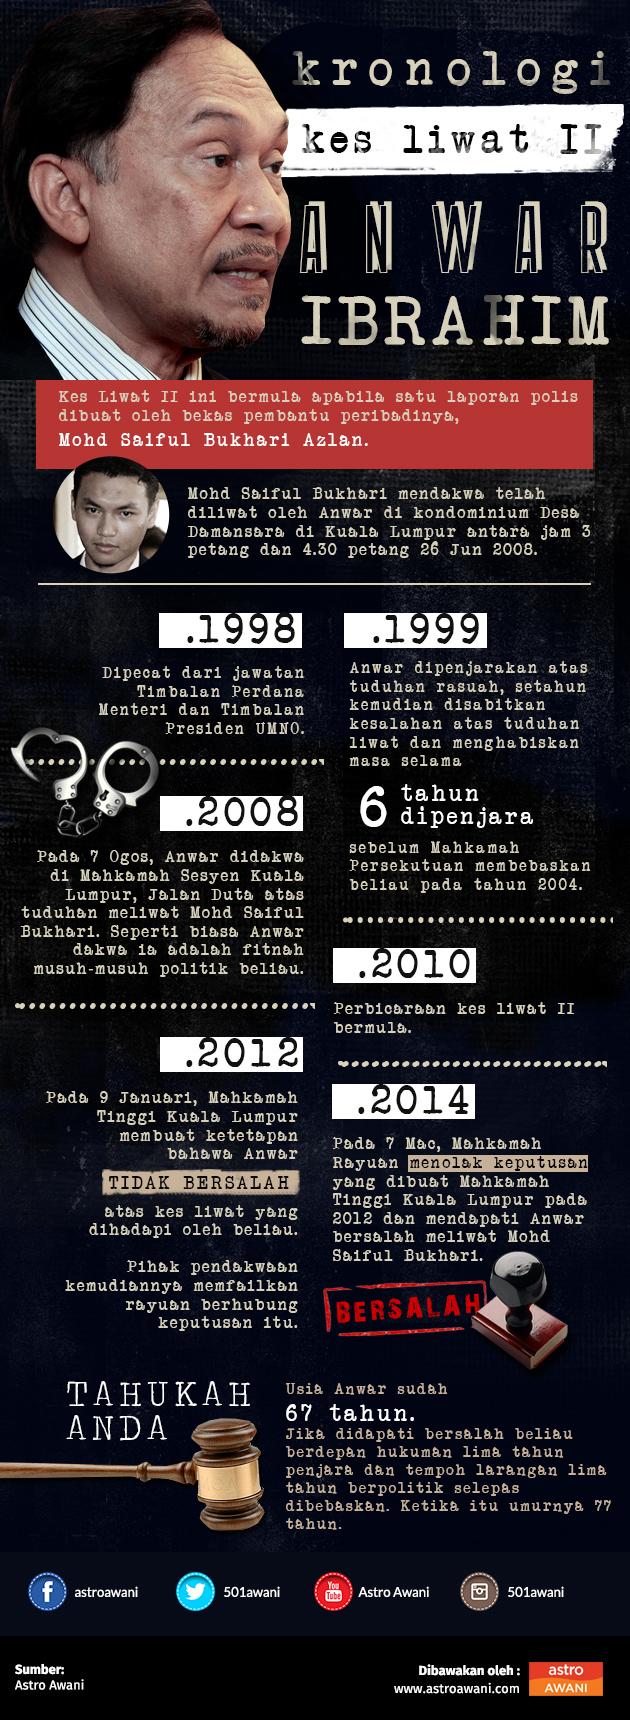 Kes Liwat II Anwar Ibrahim